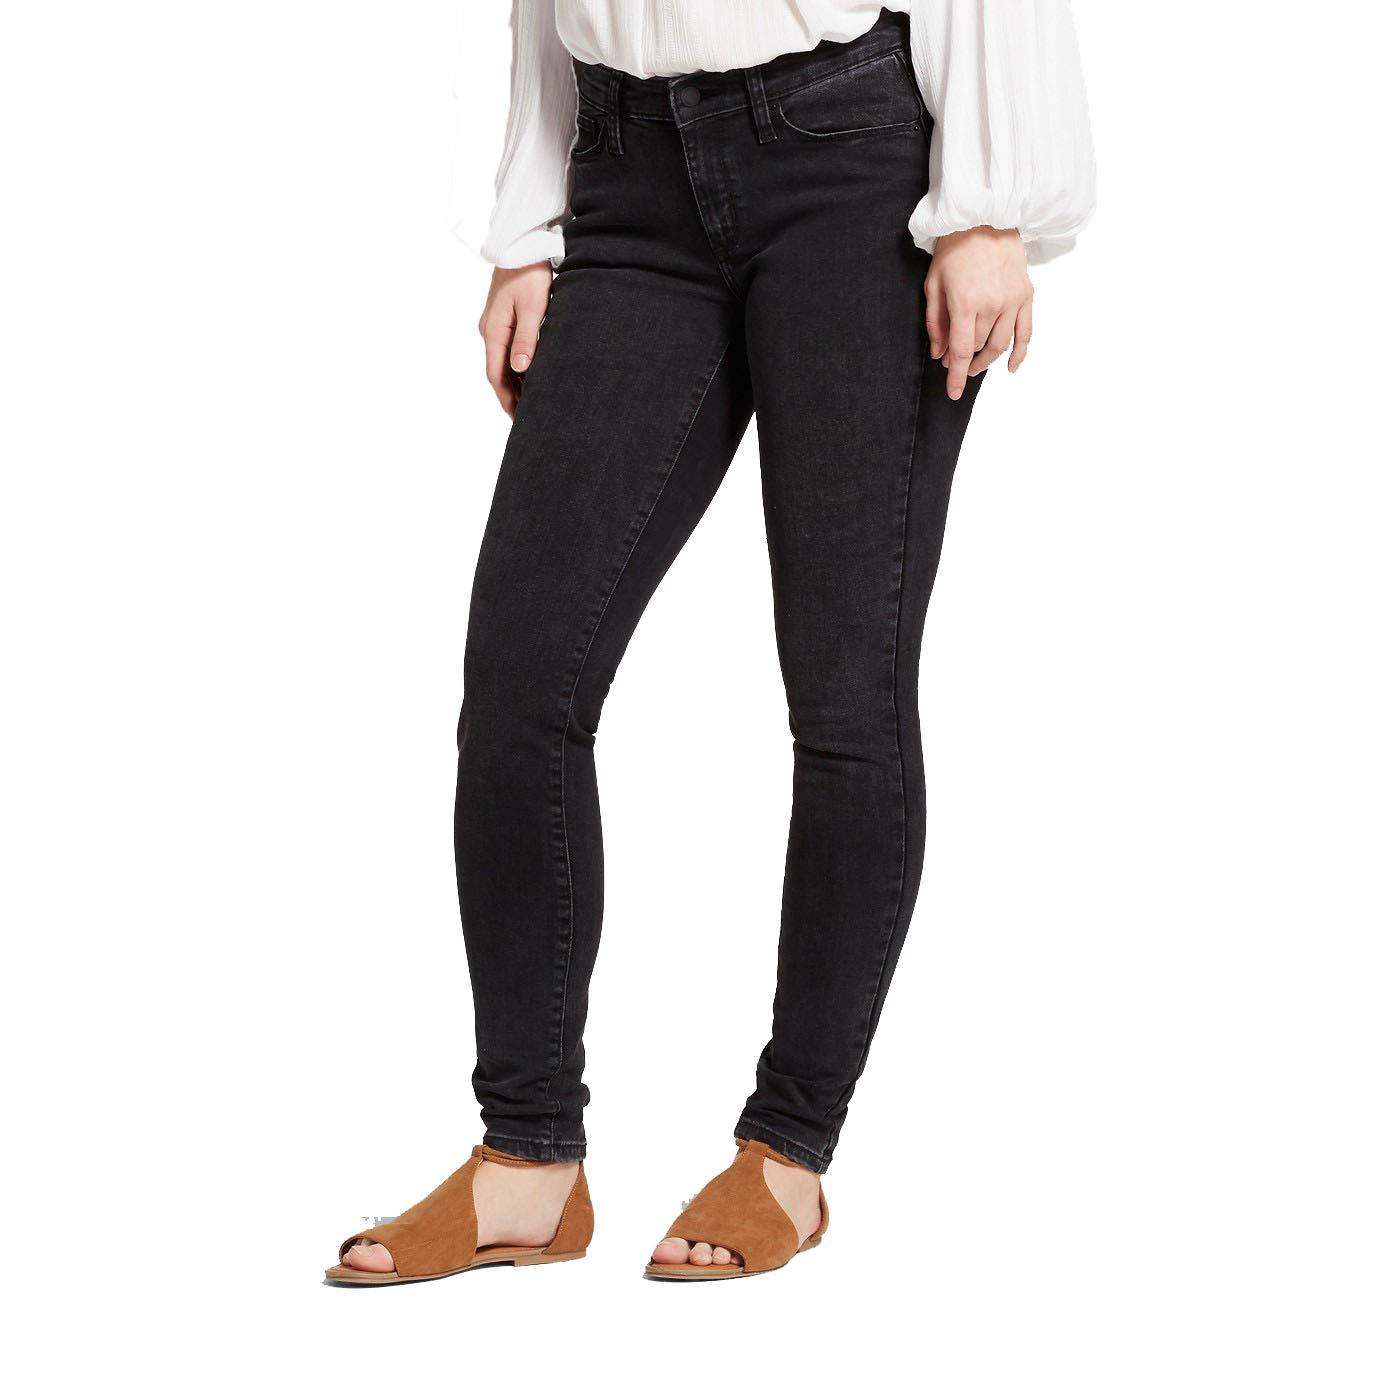 c966237c3c2 Universal Thread Women's Mid-Rise Curvy Skinny Jeans - Galaxy Black - Size  4 Reg at Amazon Women's Jeans store